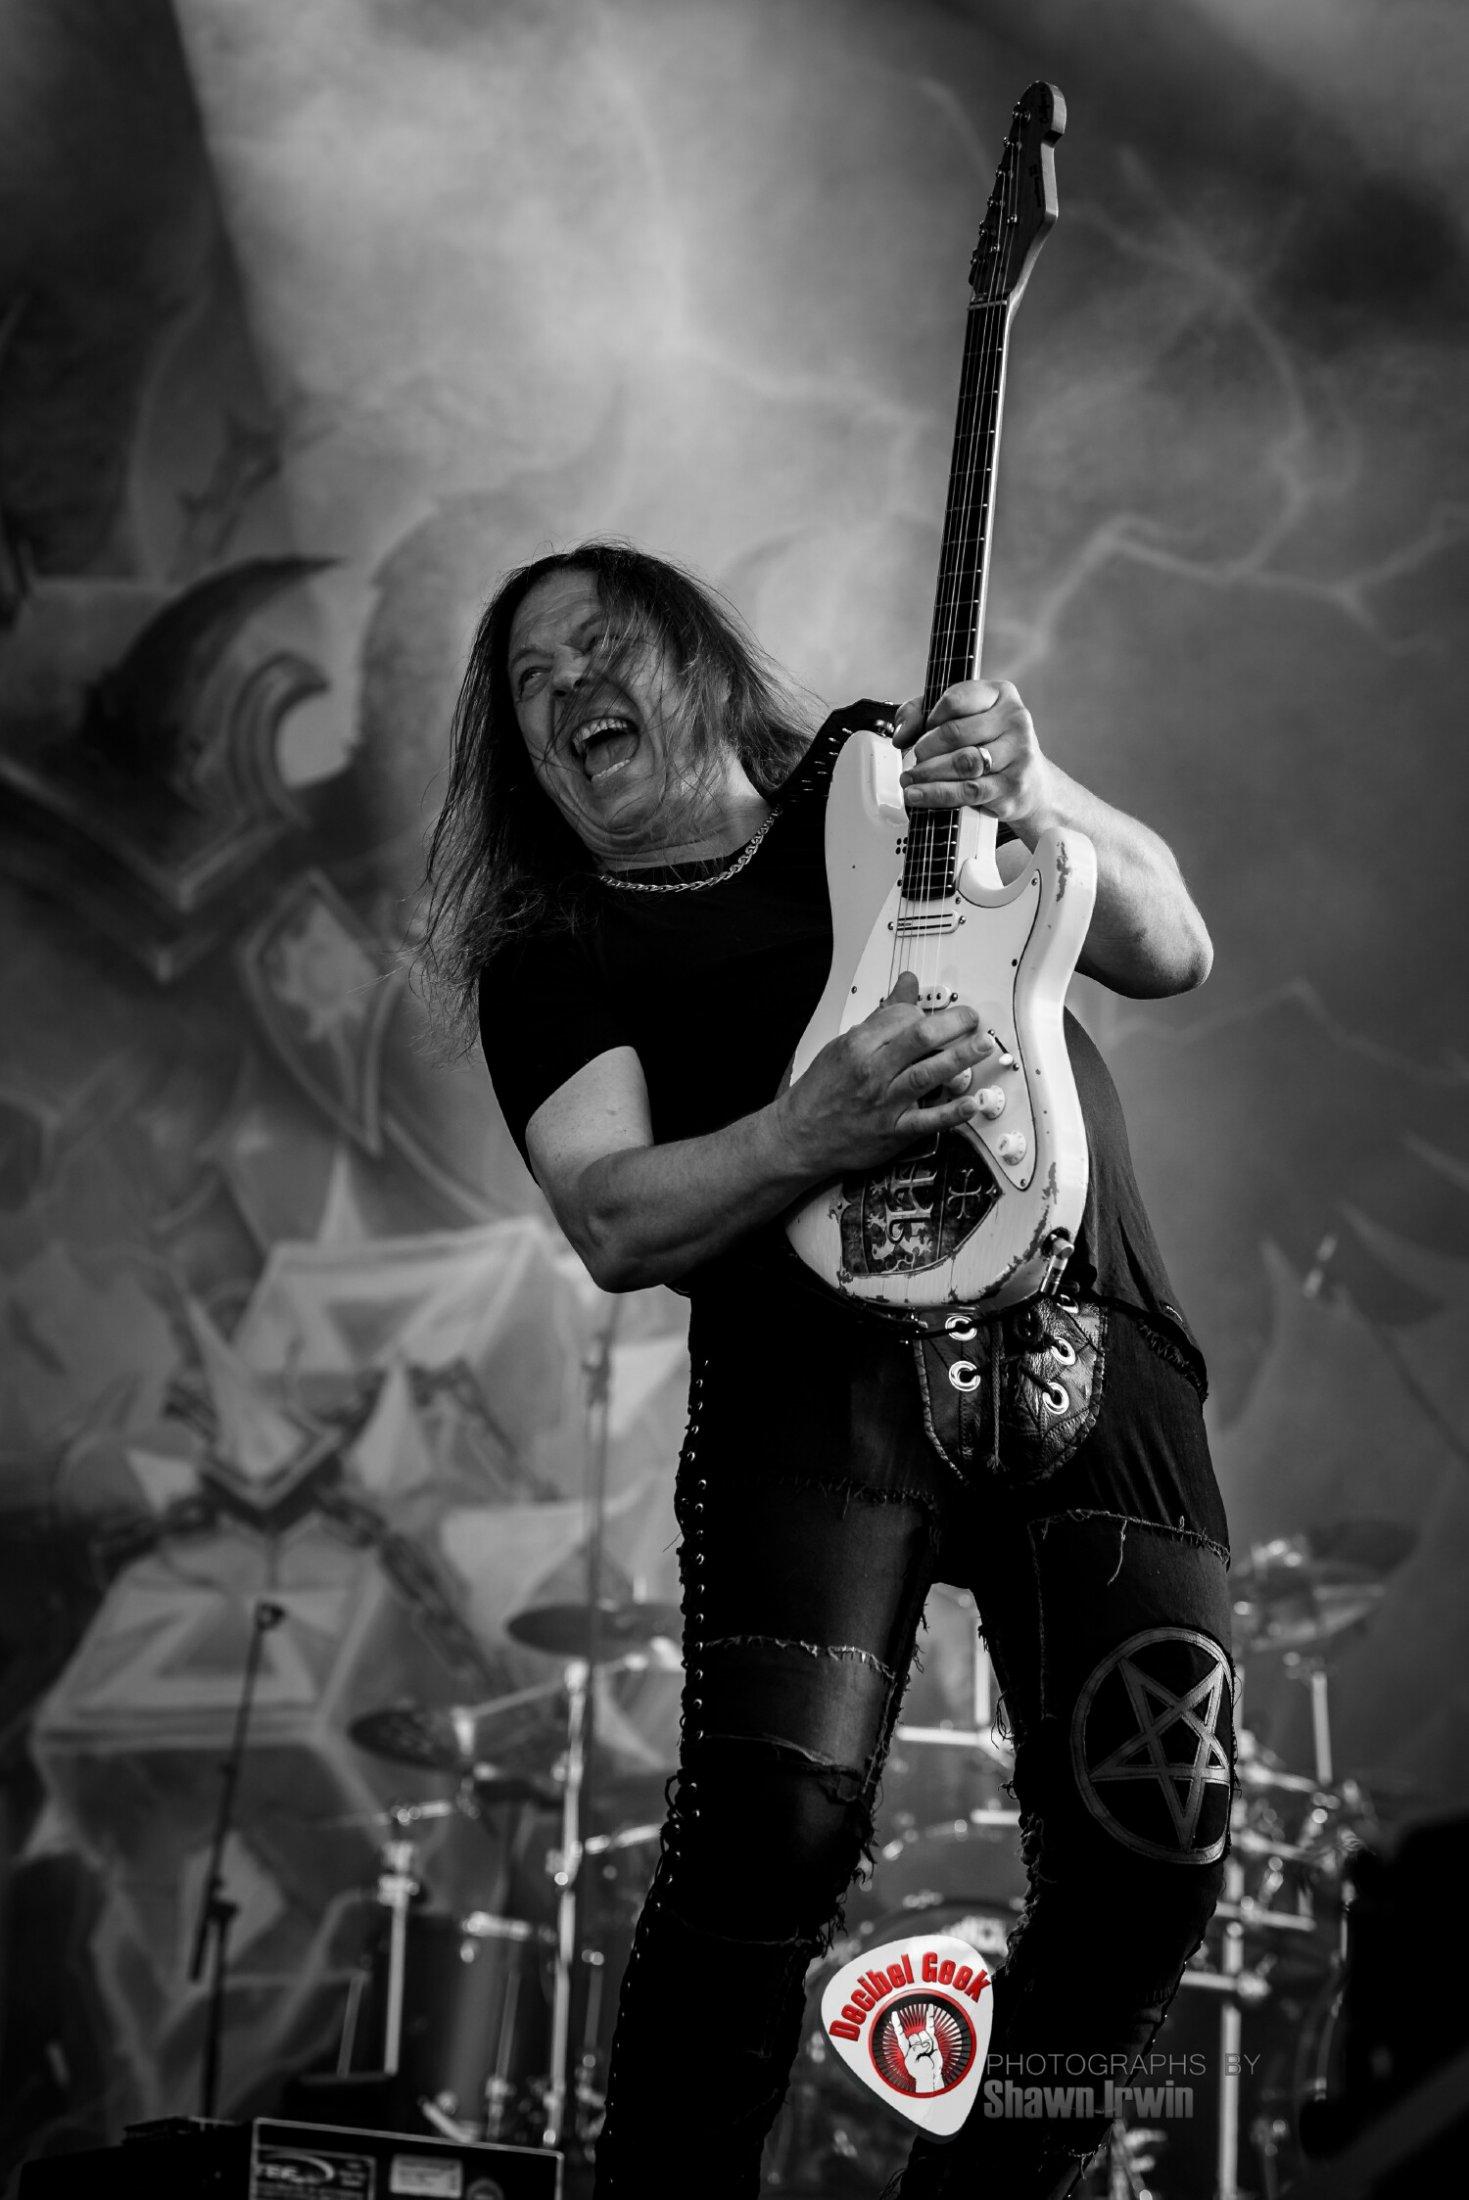 Hammerfall #13-SRF 2019-Shawn Irwin